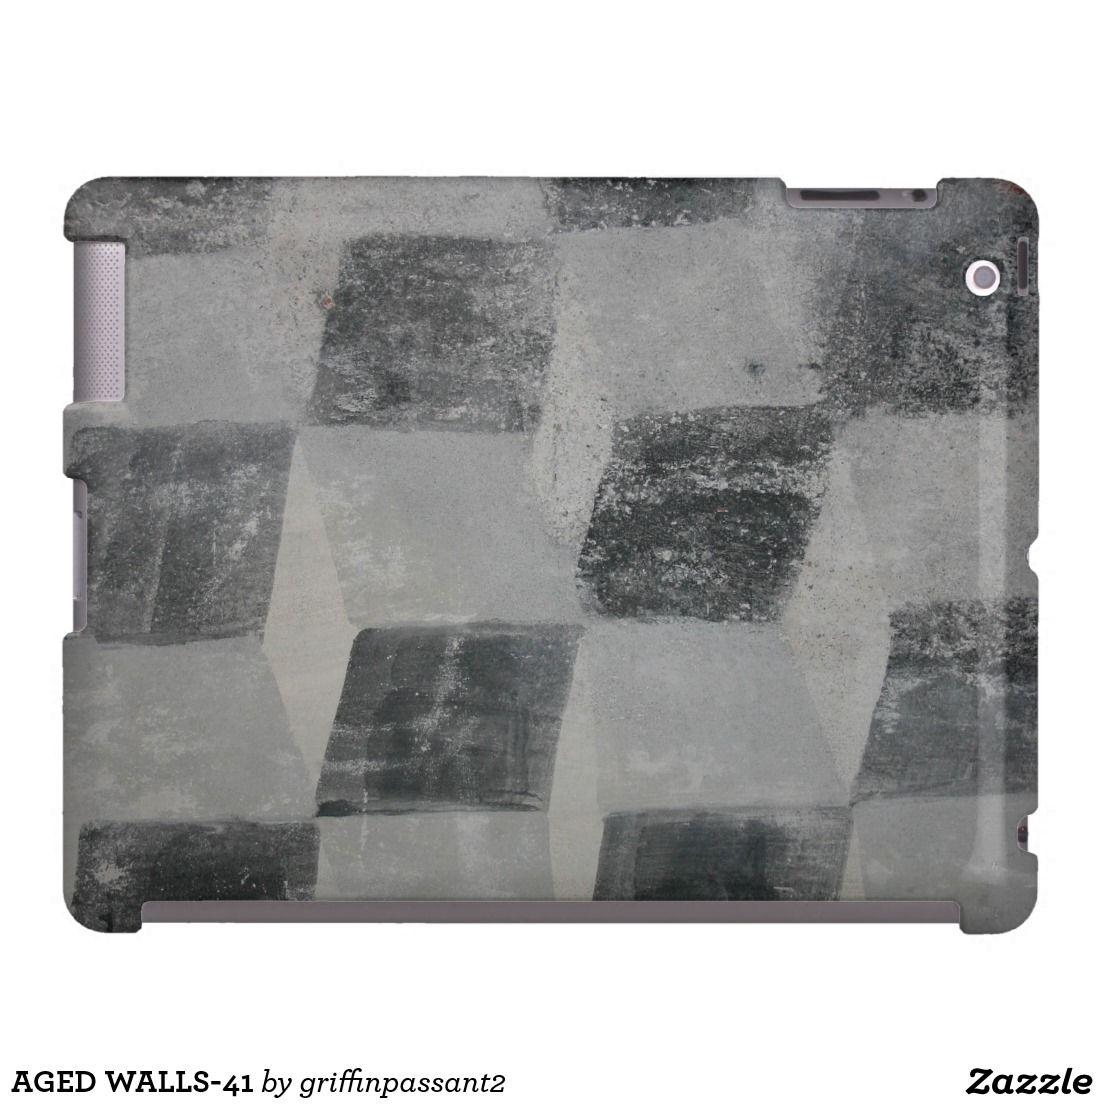 AGED WALLS-41